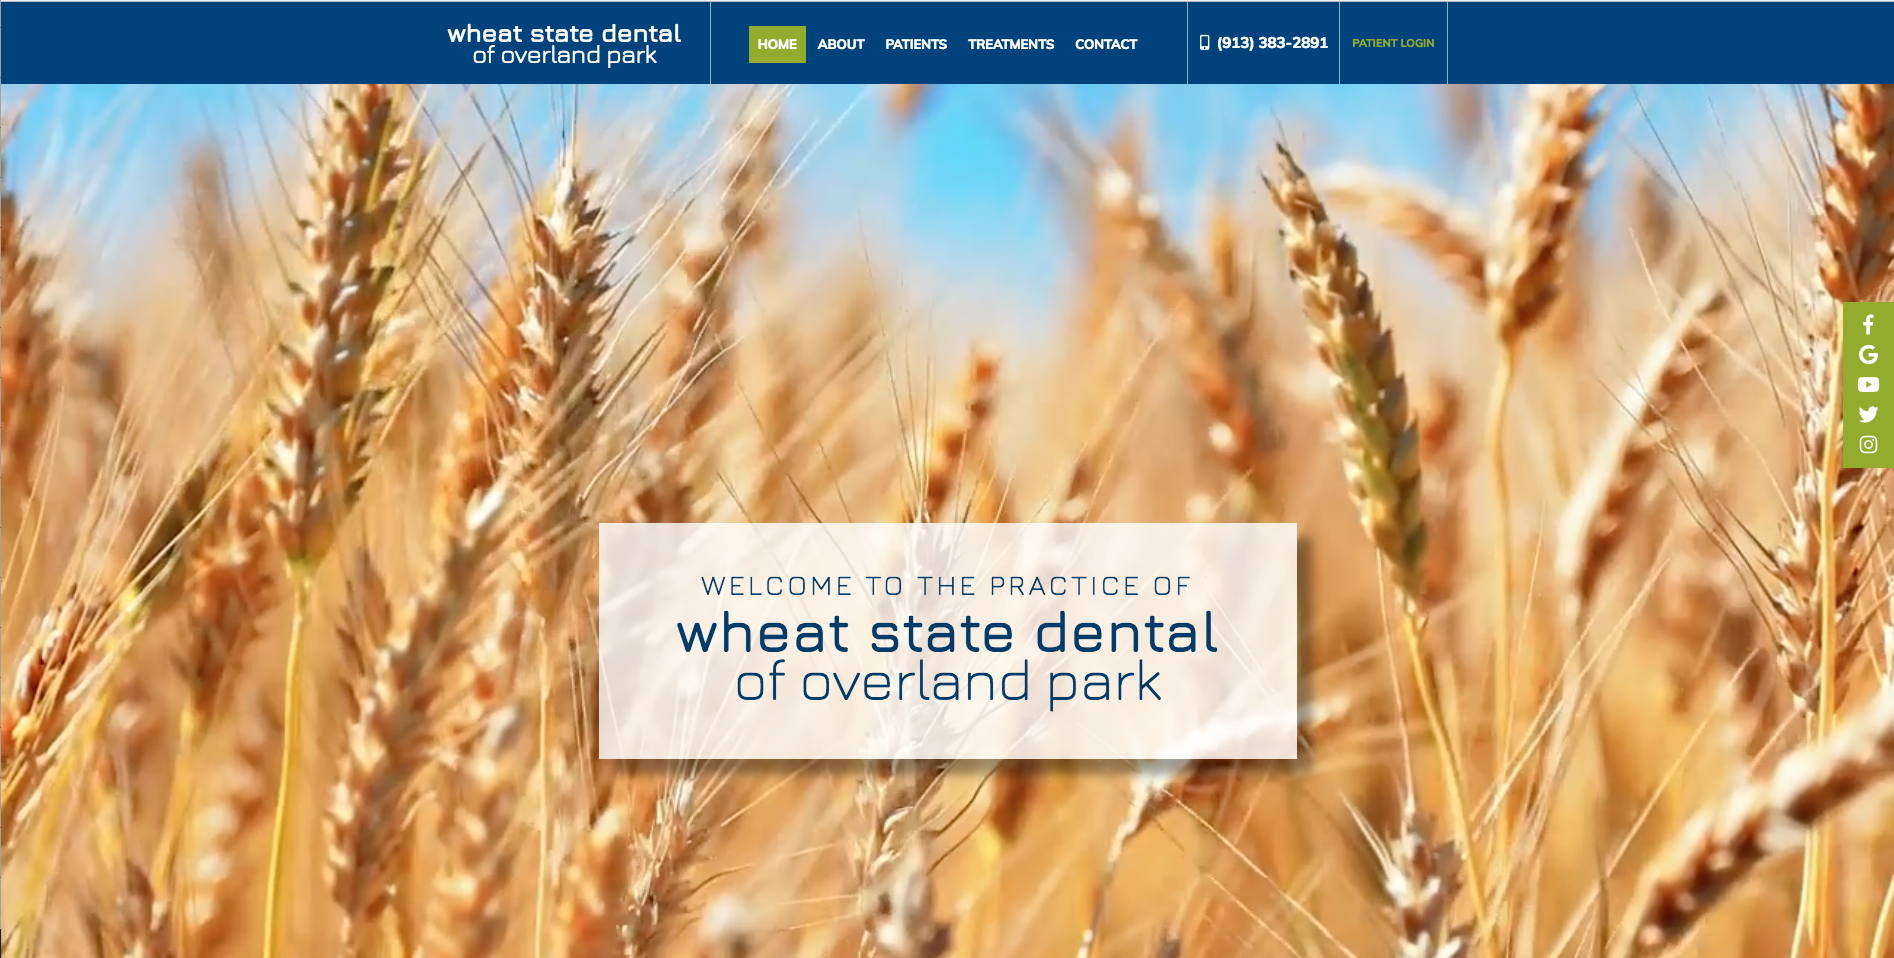 Sesamewebdesign Psds Dental Responsive Video Blue Green Sticky Sans Photography Texture Wood Dental Place Card Holders Overland Park